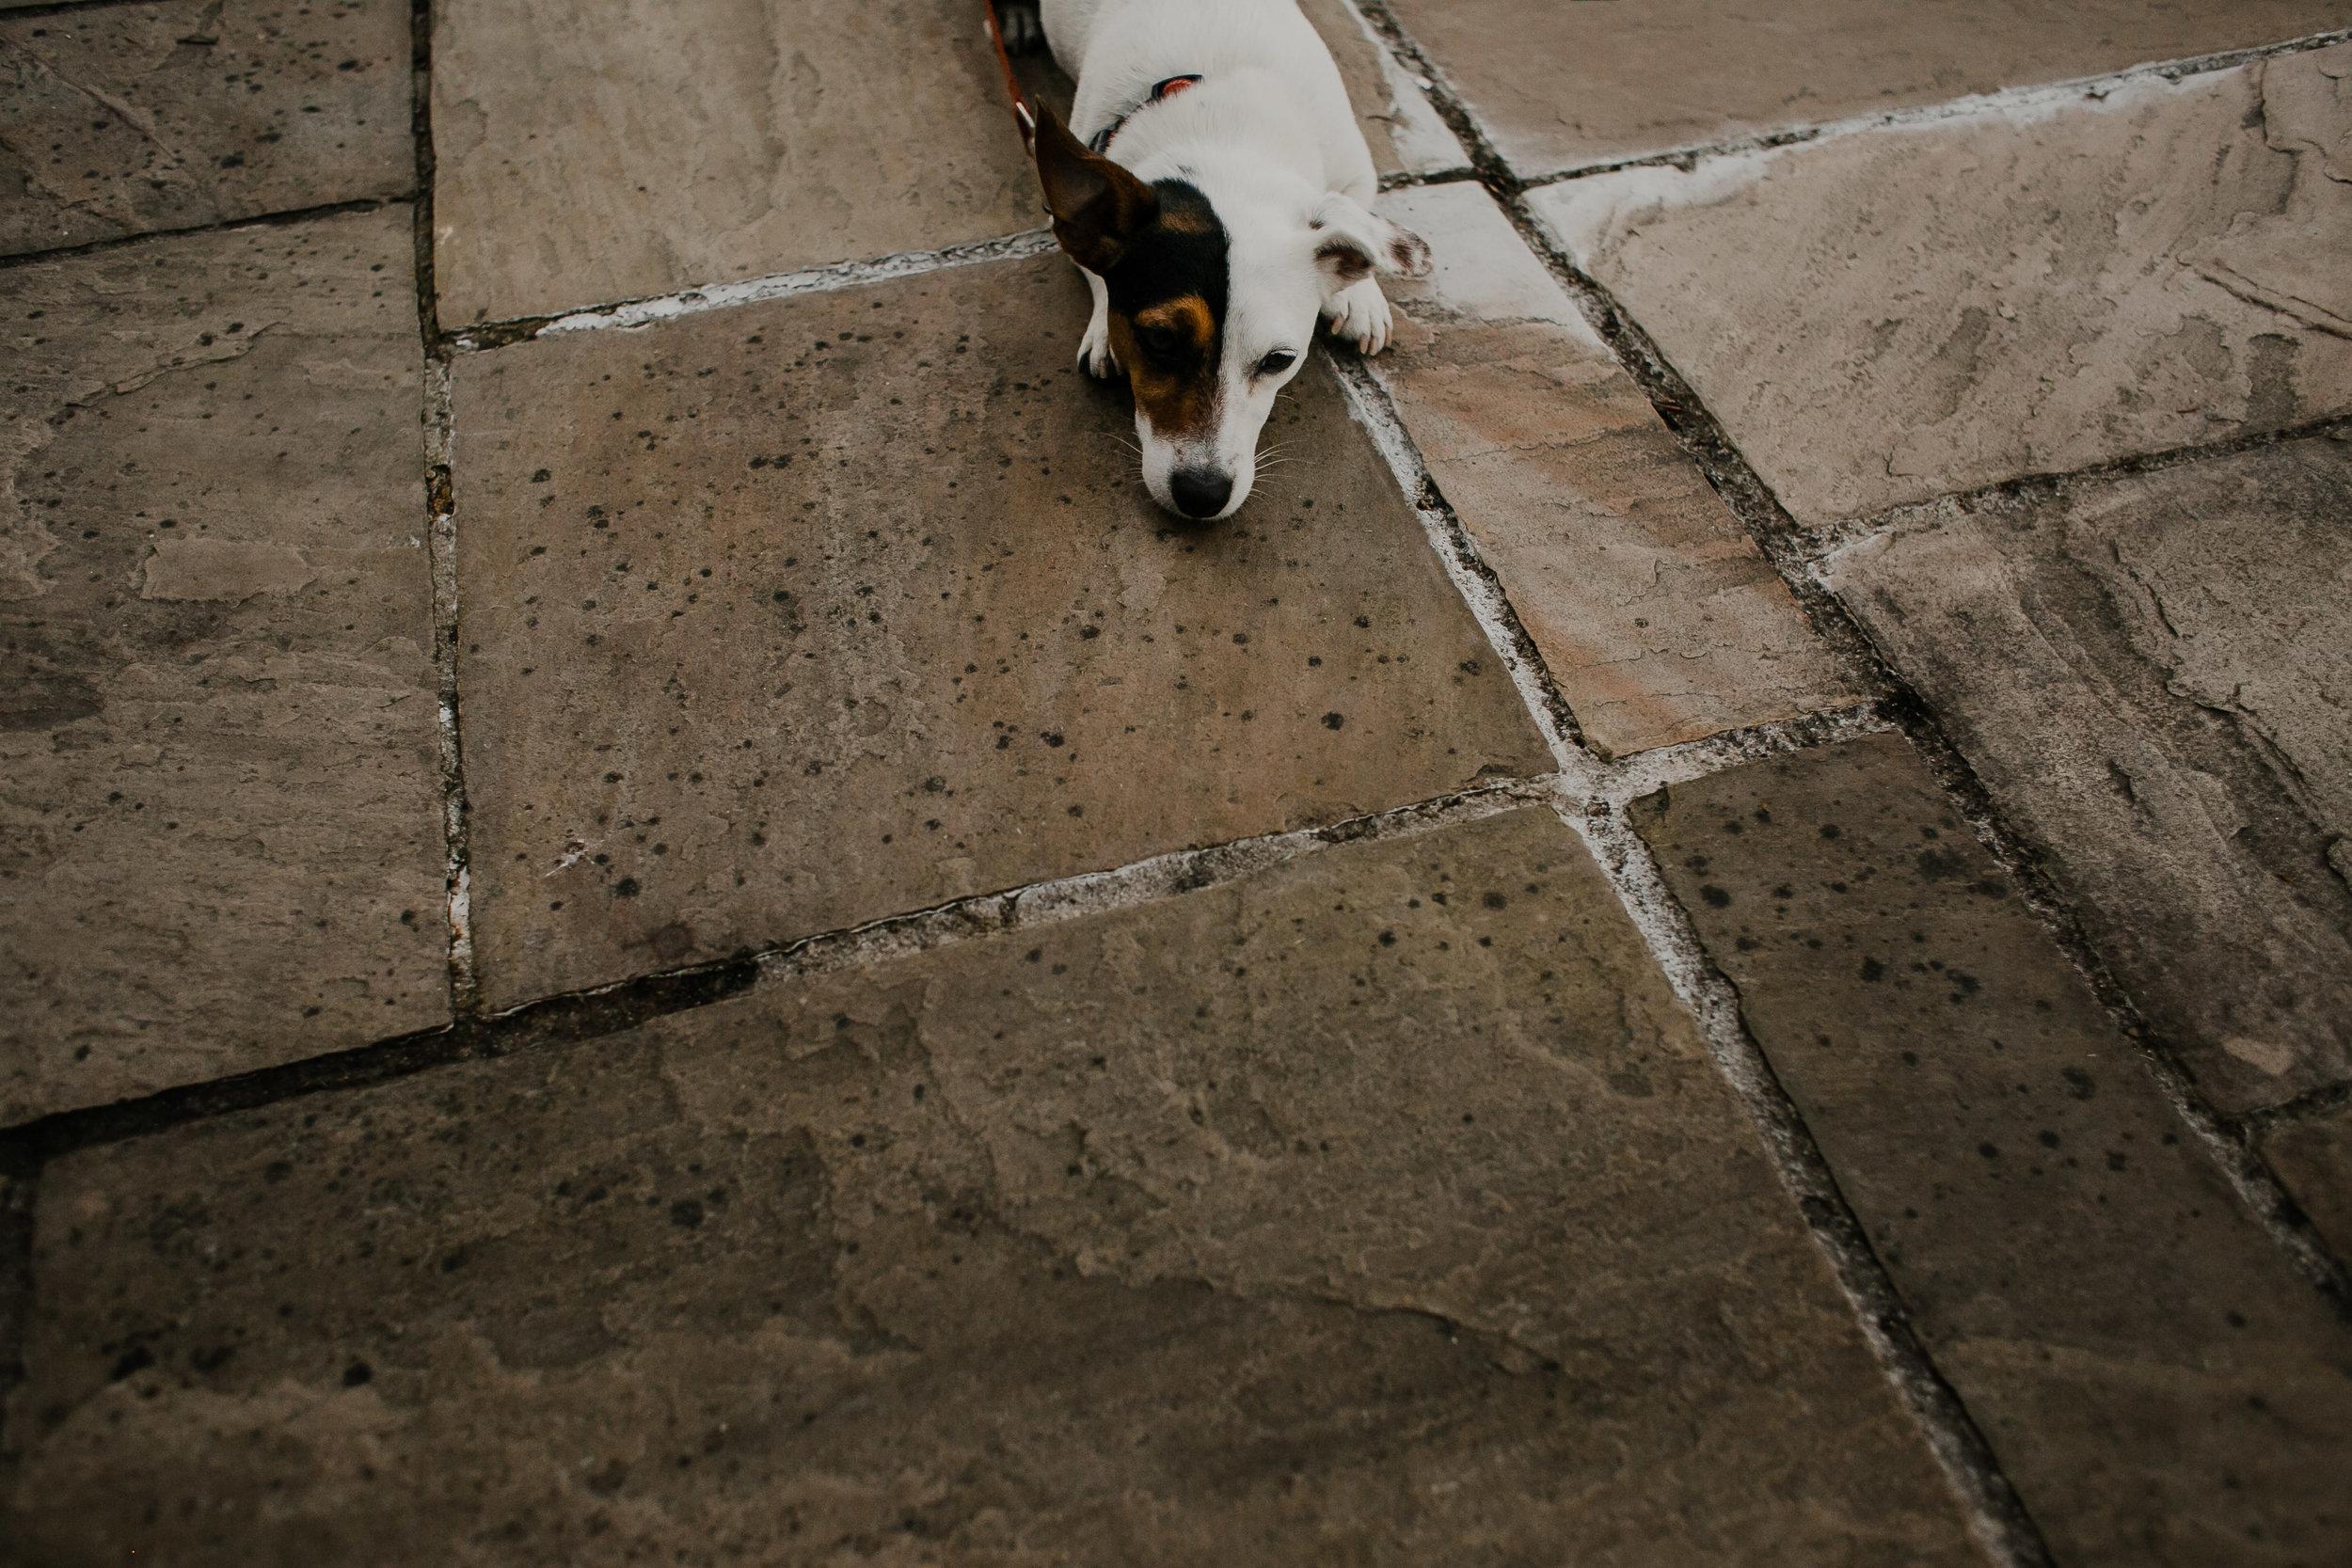 LochLomondWeddingBlogPostextra1-8.jpg